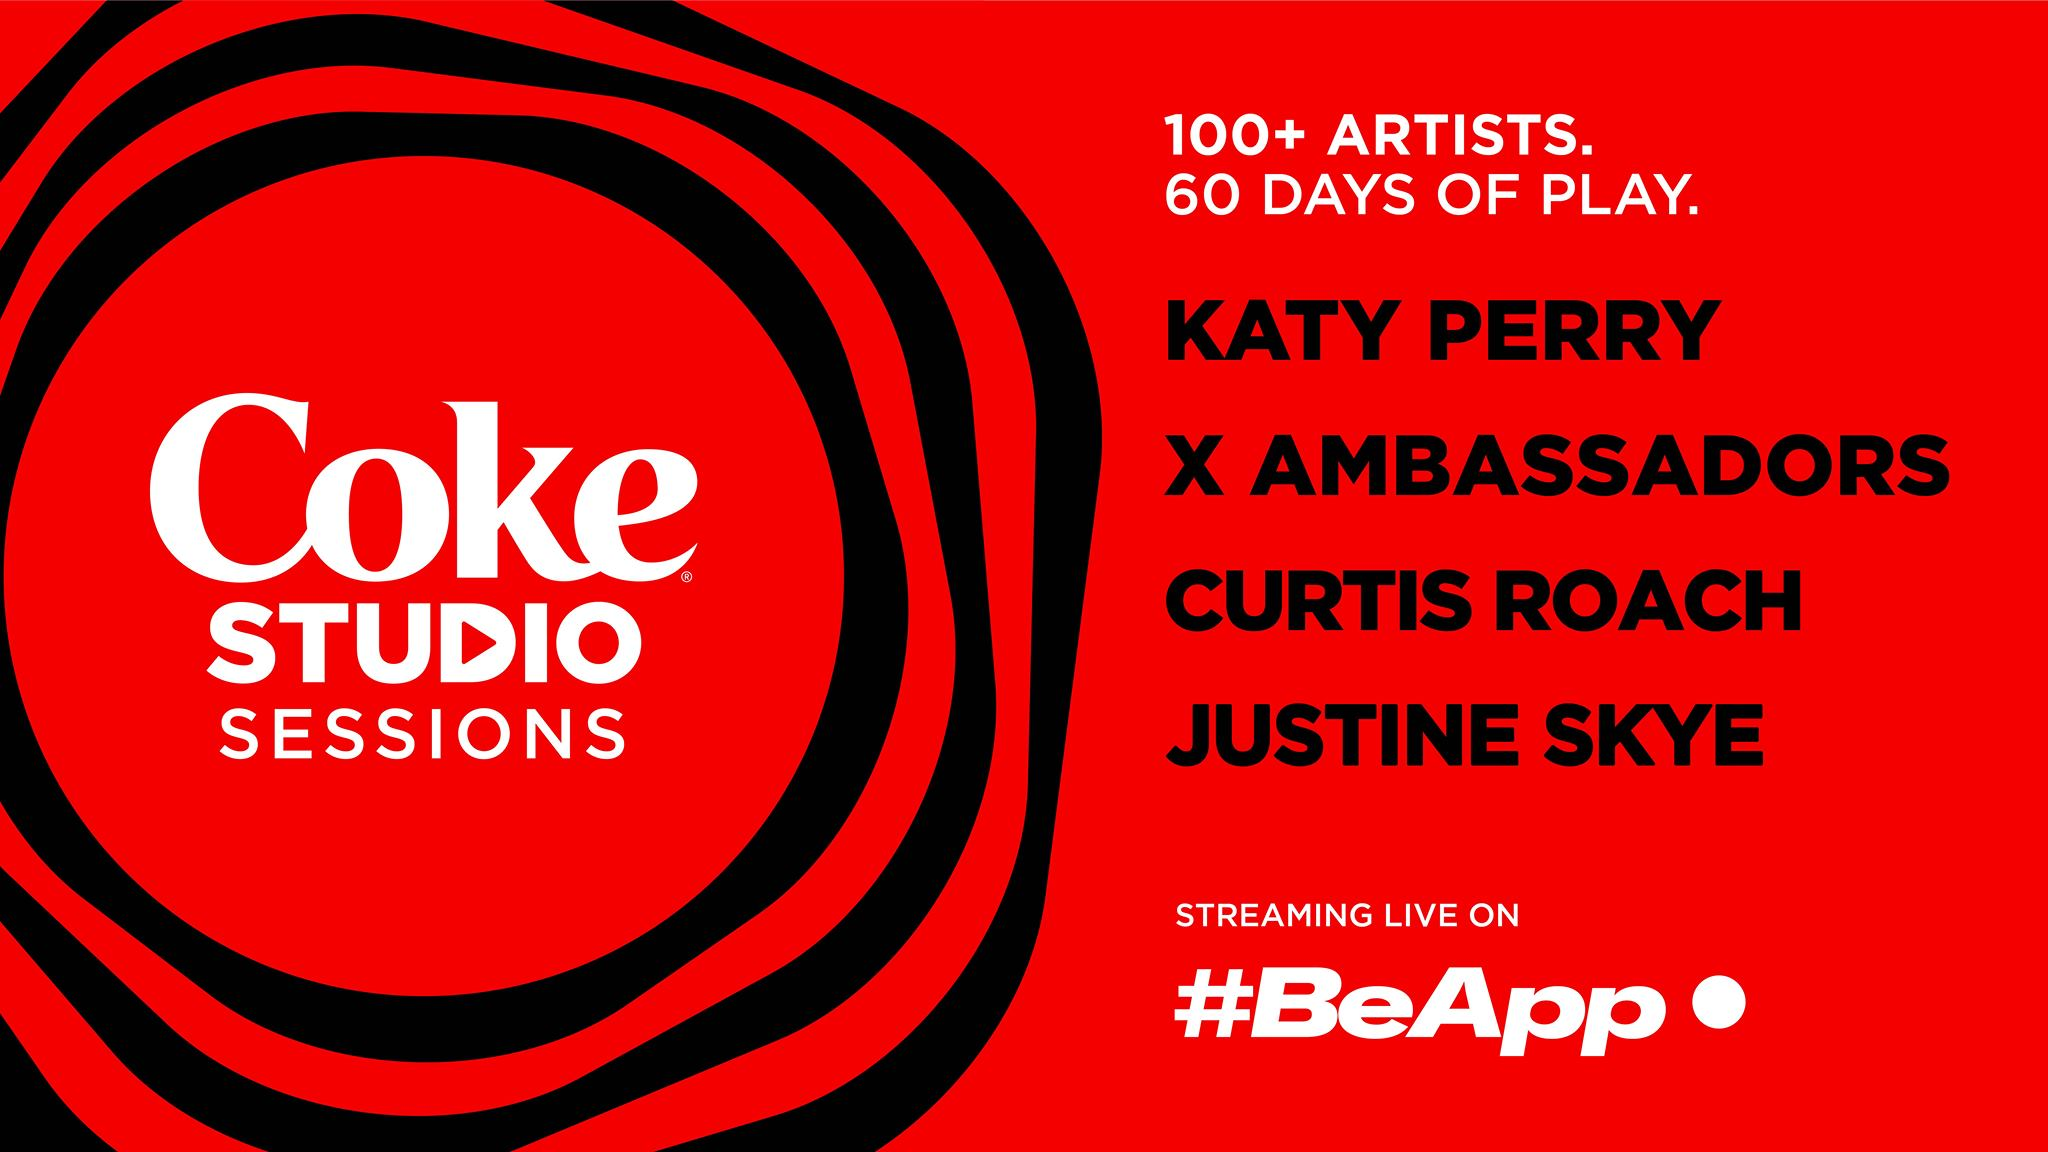 Live Streaming Platform #BeApp Partners With Coke Studio Sessions